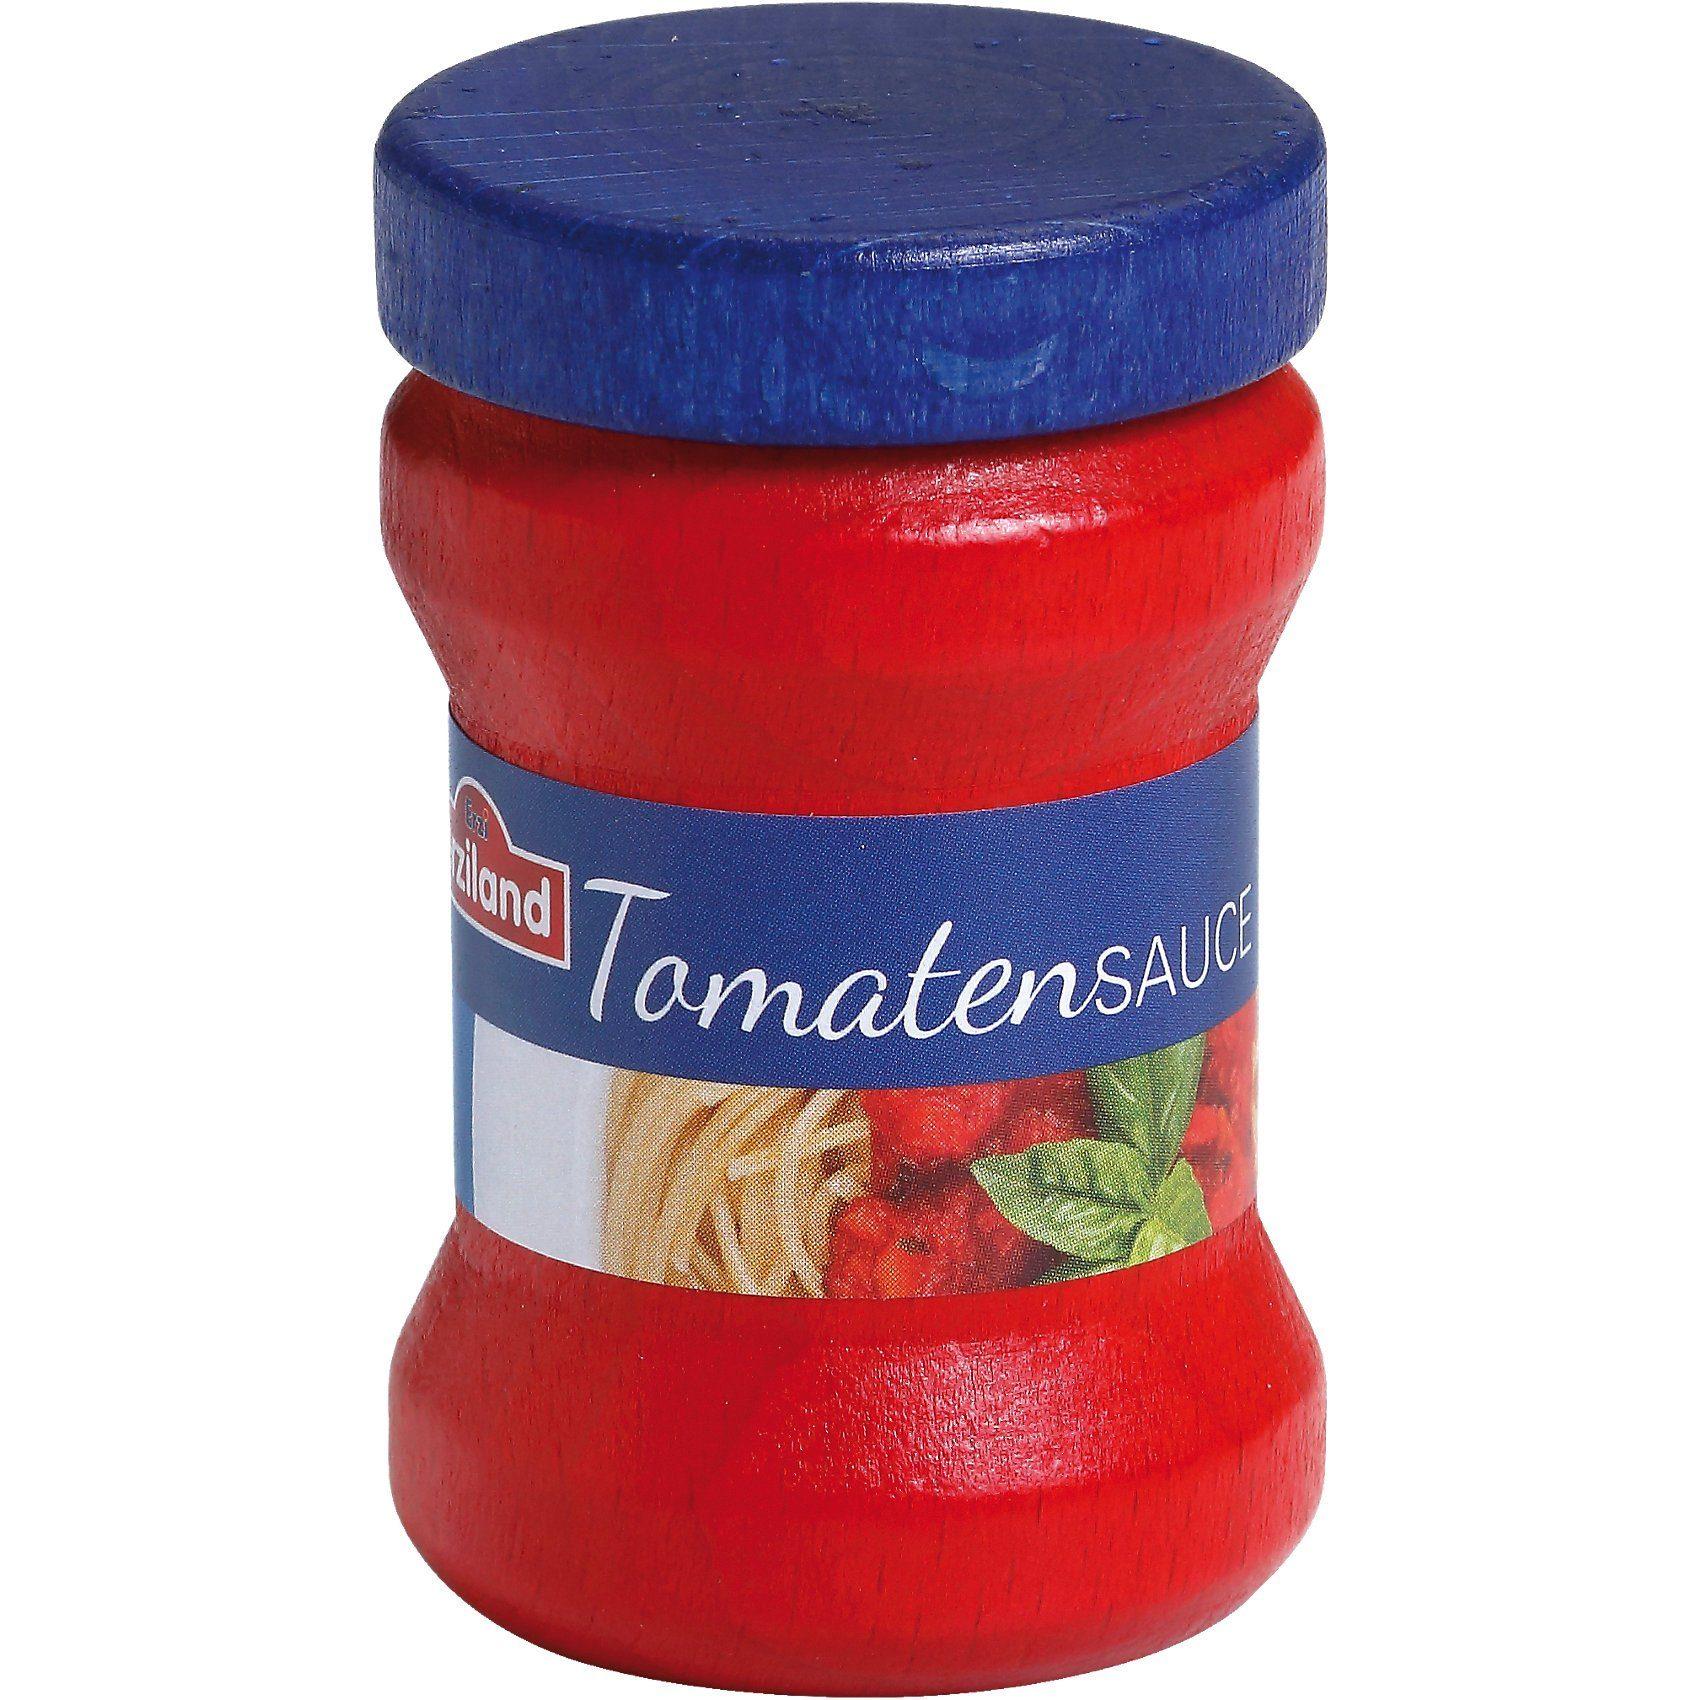 ERZI Spiellebensmittel Tomatensauce